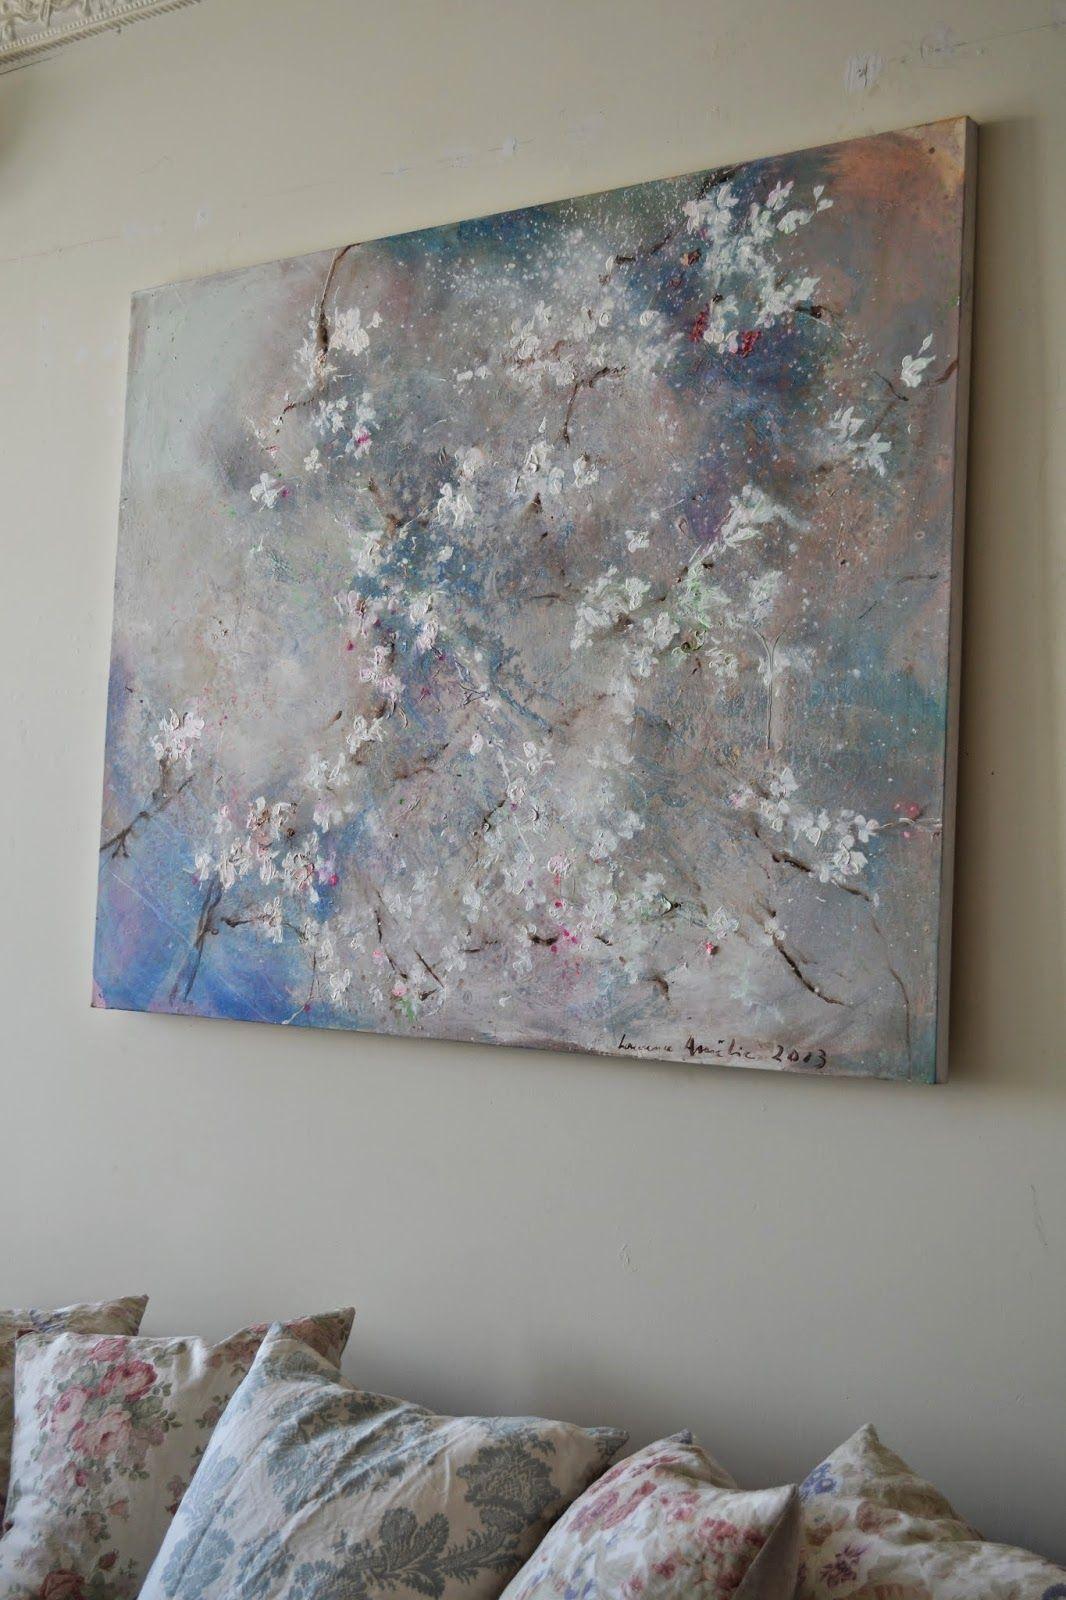 Laurence Amelie painting - Rachel Ashwell Shabby Chic Couture Santa Monica Store - image paintmewhite.com